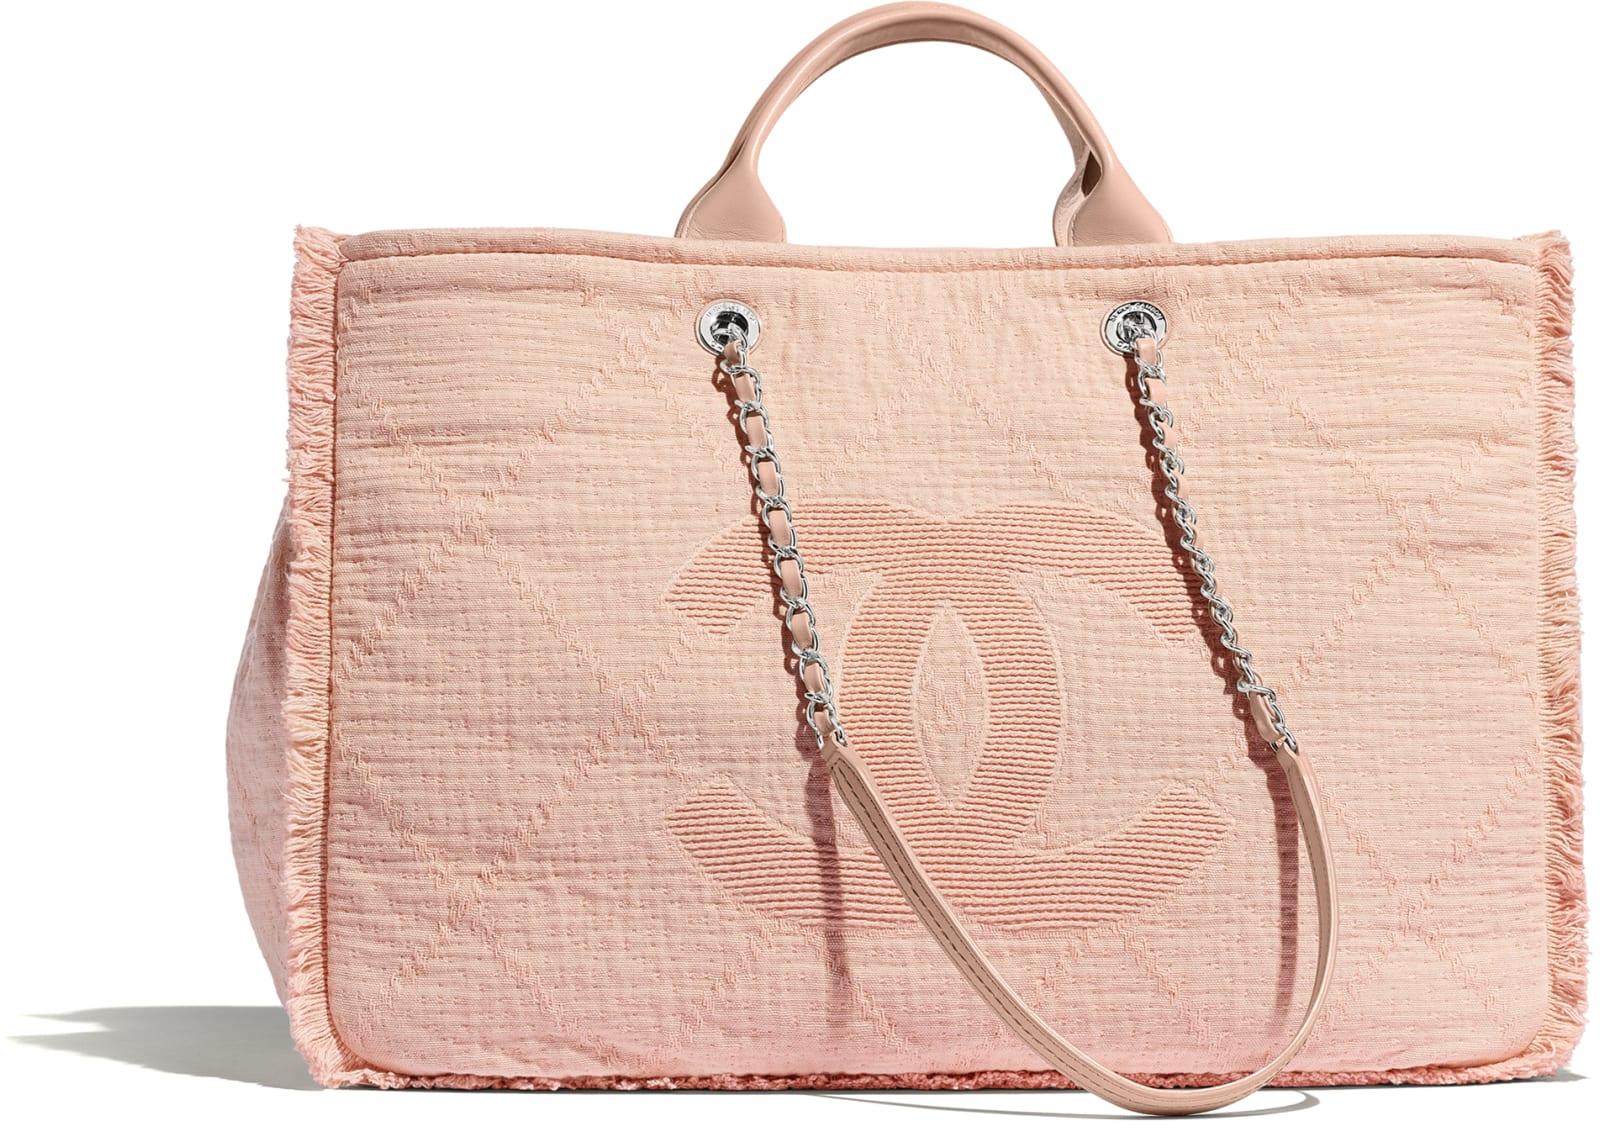 Borsa a spalla rosa in fibre miste Chanel a 2800 euro